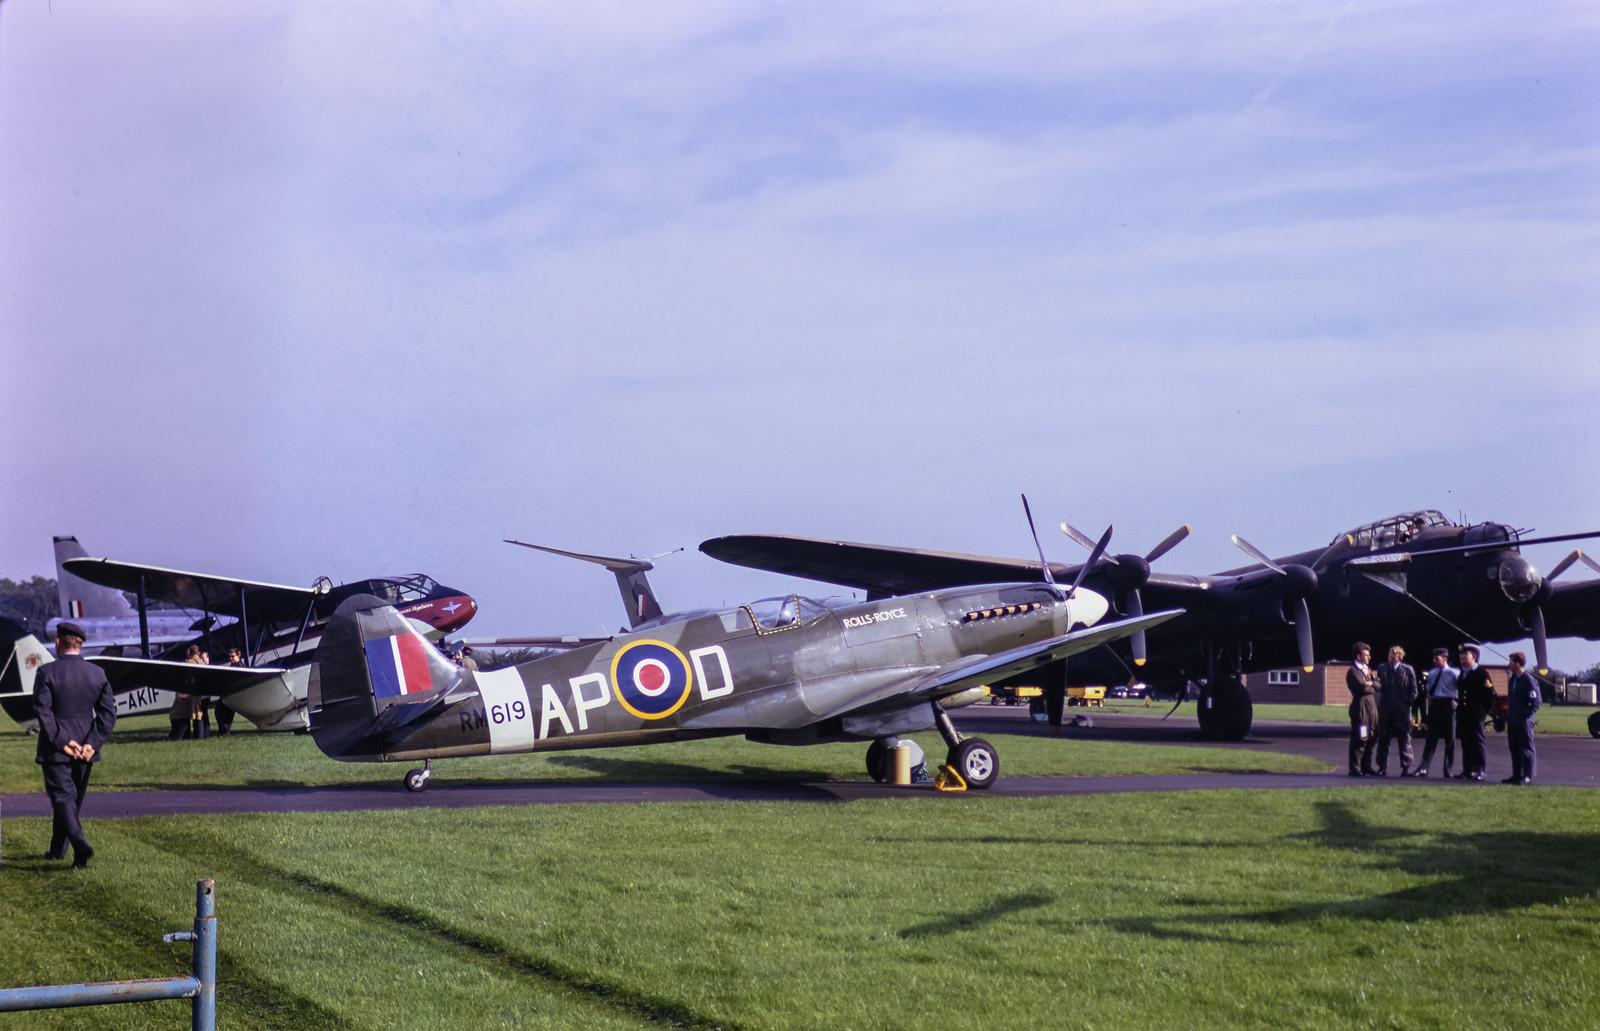 RAF Finningley airshow 1969 - FighterControl